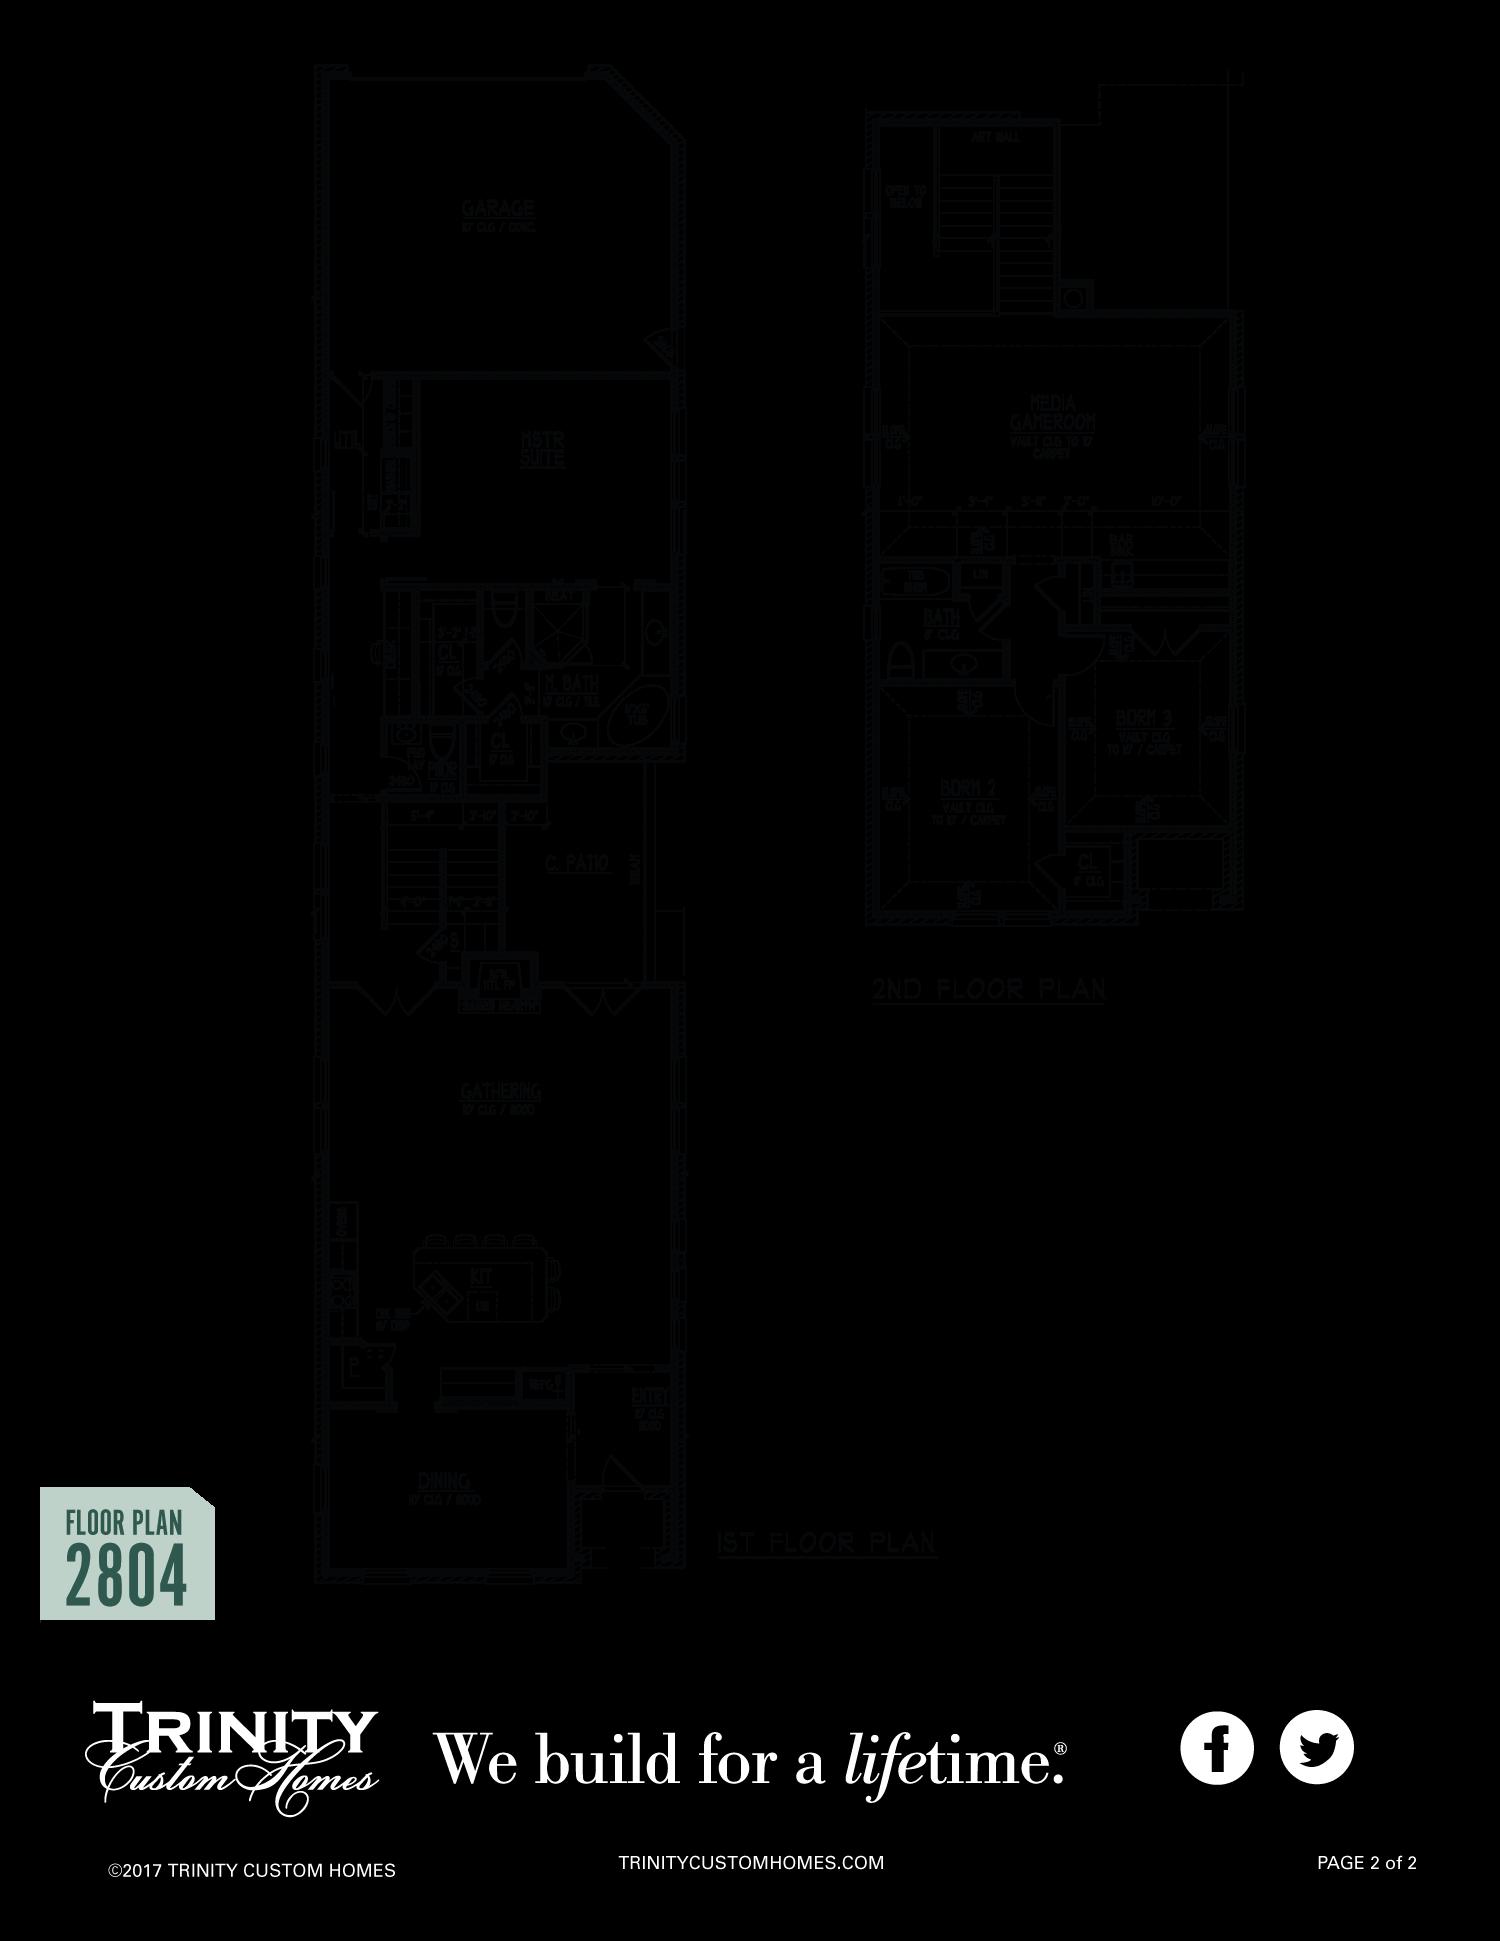 FloorPlan2804